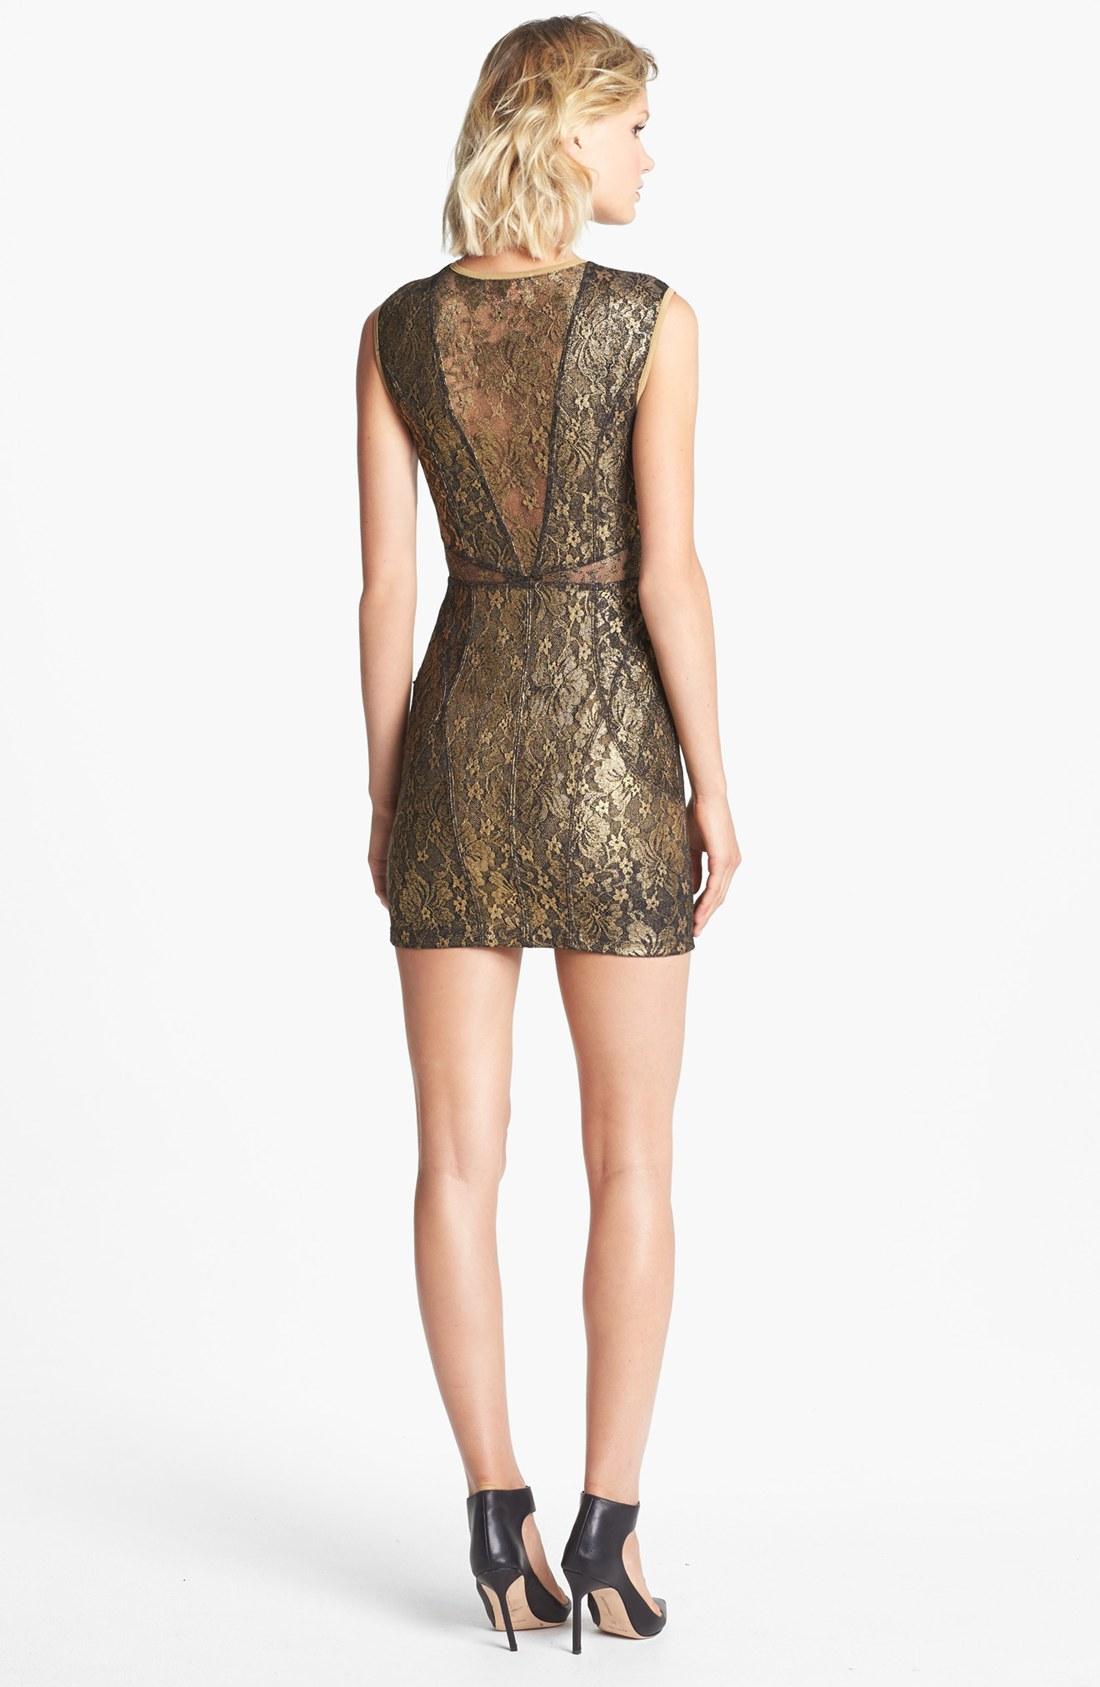 Golden lace bodycon dress